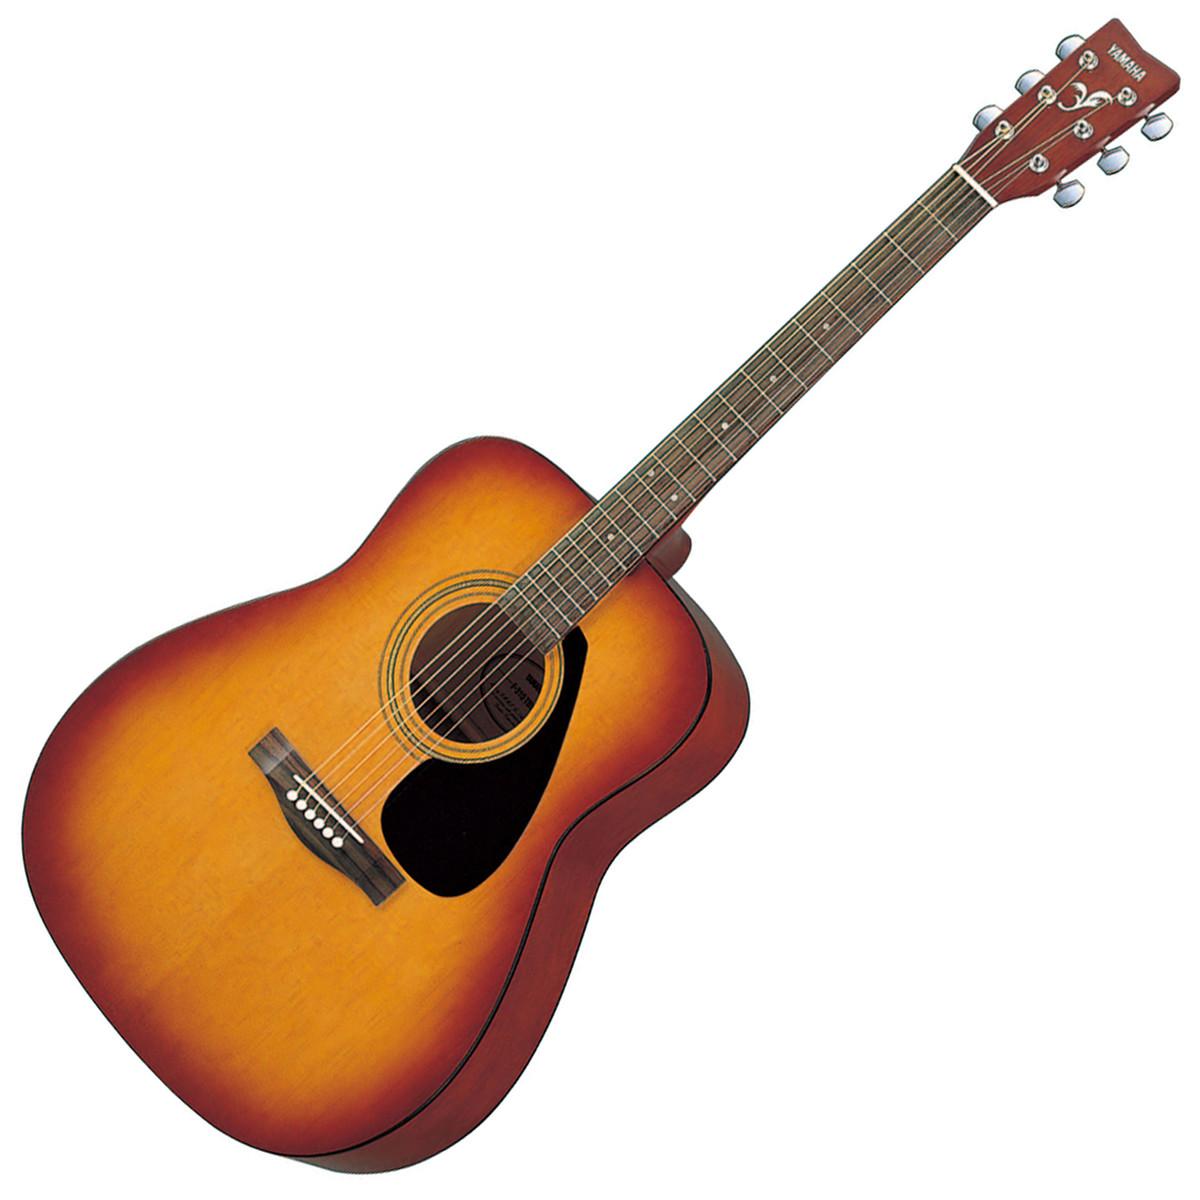 Yamaha f310 acoustic guitar tobacco brown sunburst box for Acoustic yamaha guitar